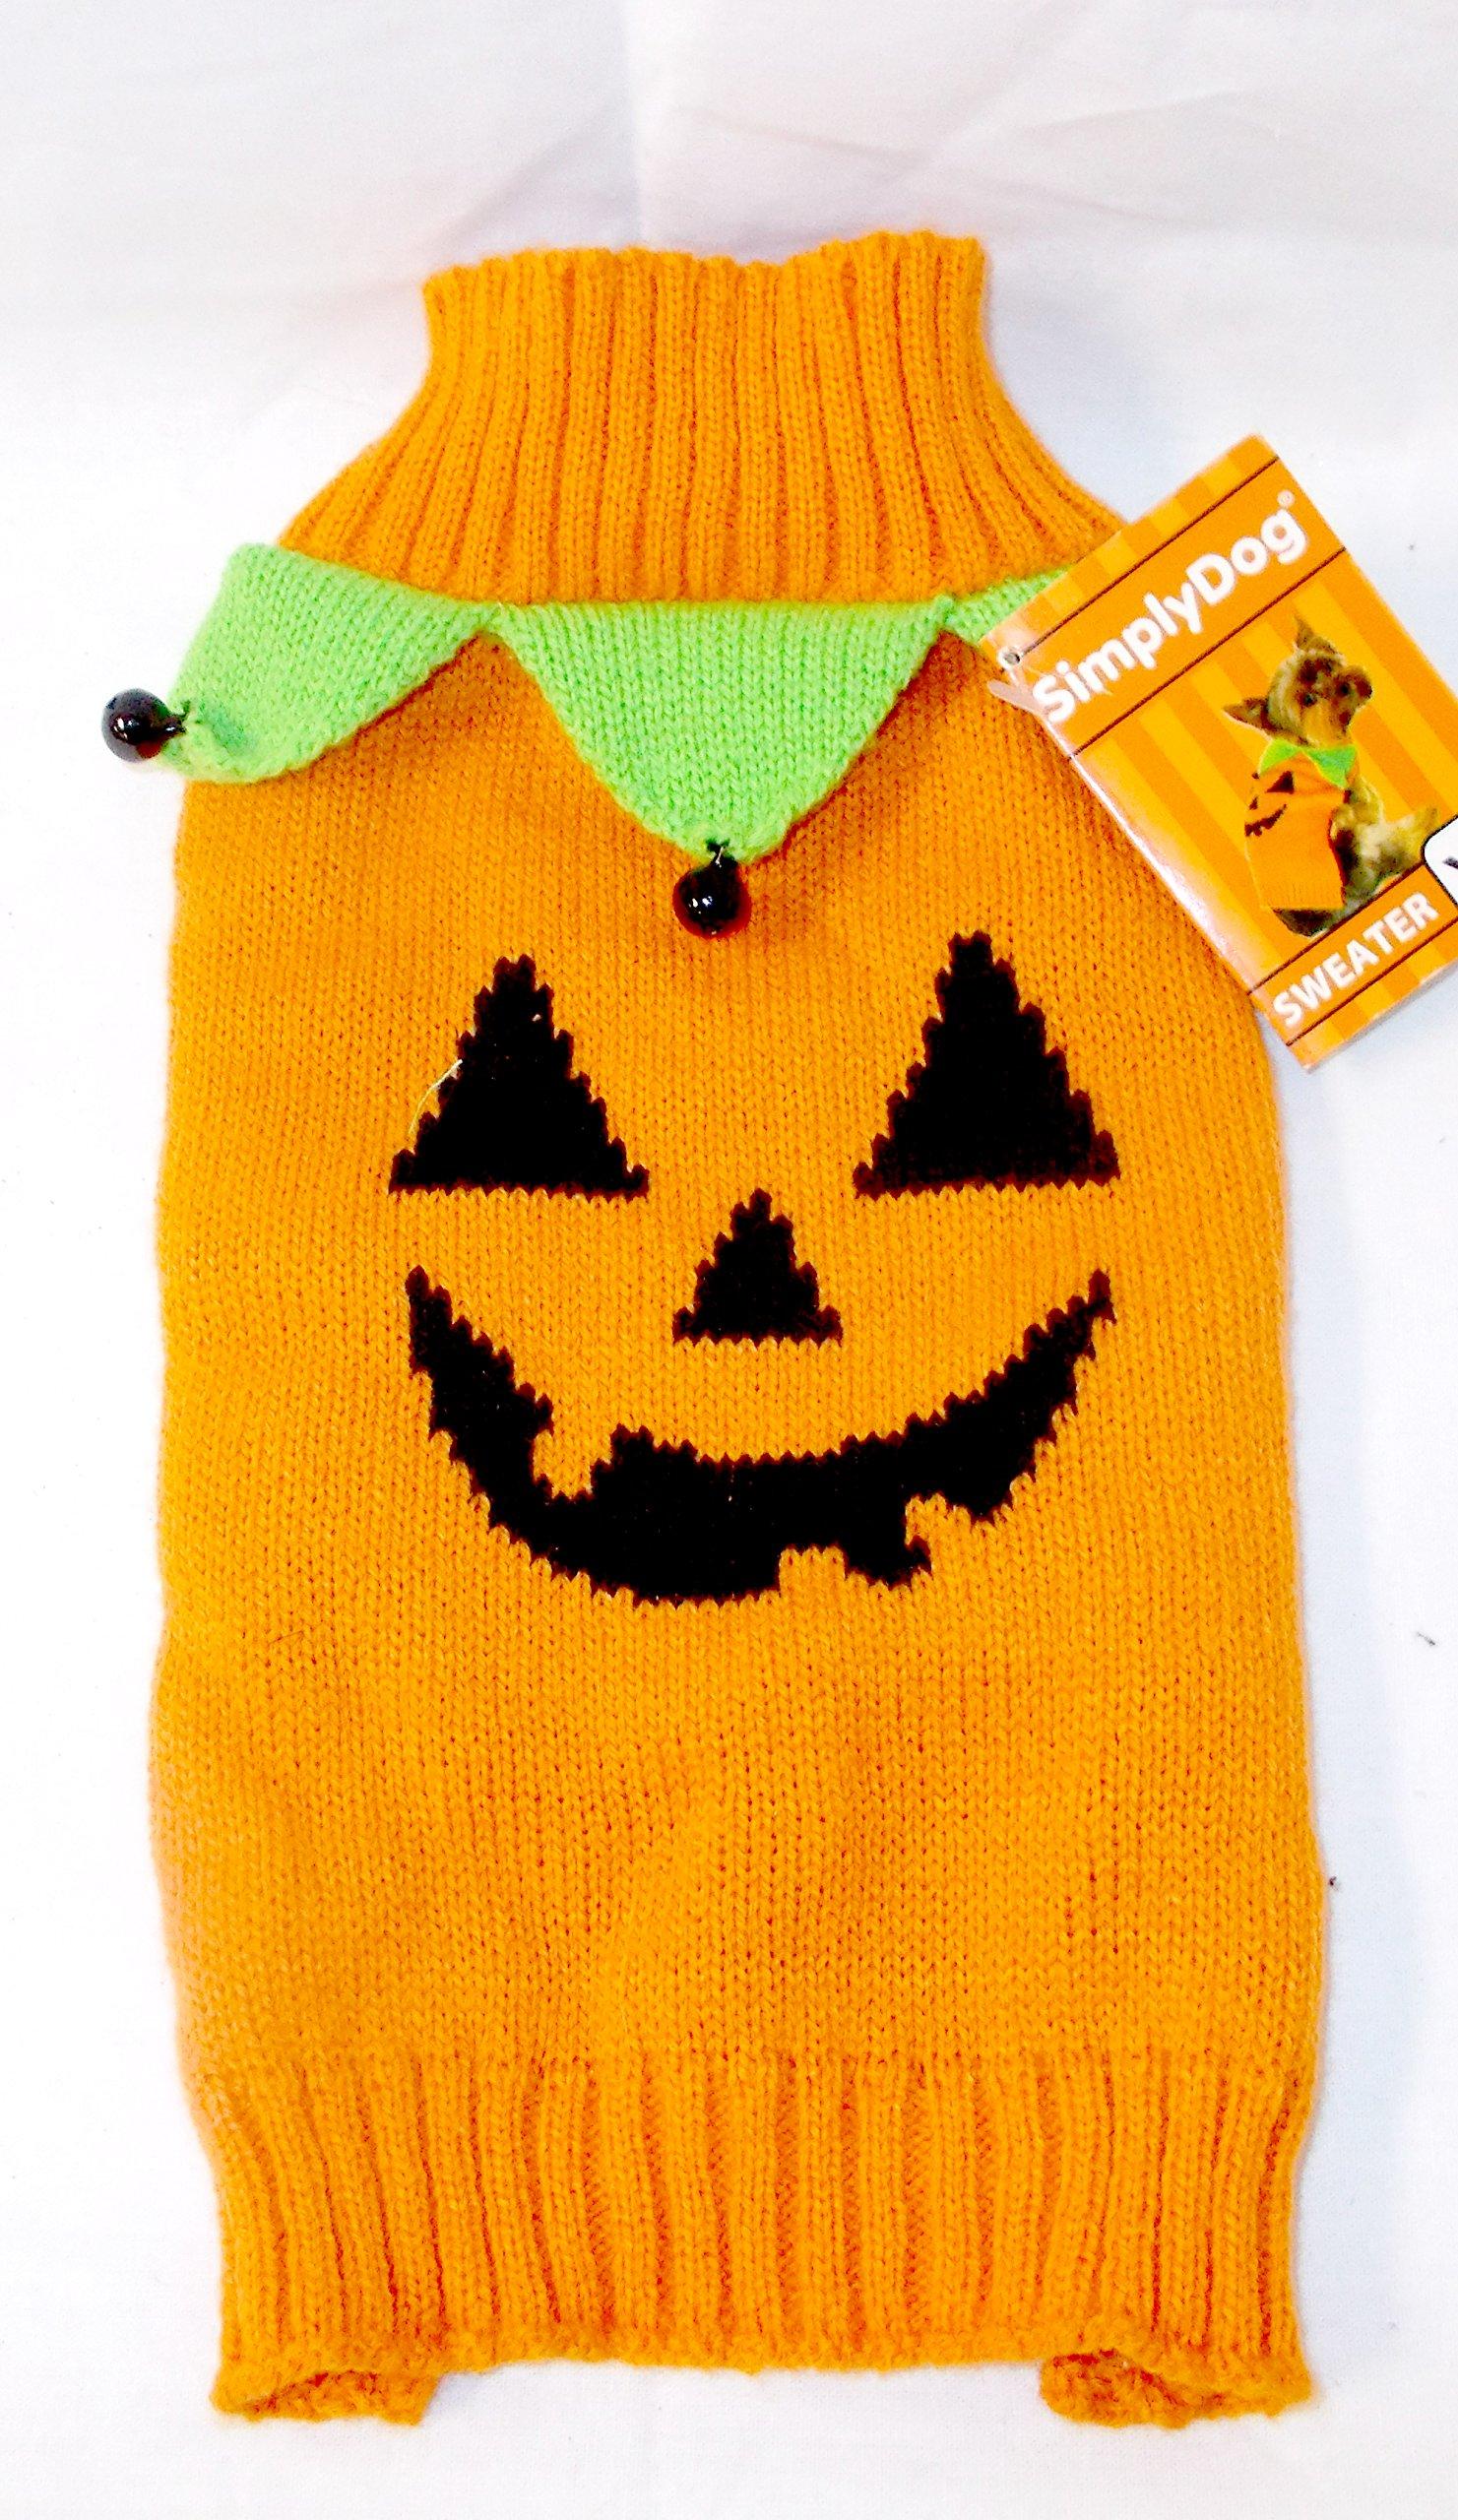 SimplyDog Orange Jack O Lantern Pumpkin Sweater Jester Collar Jingle Bells S 14-17' NWT